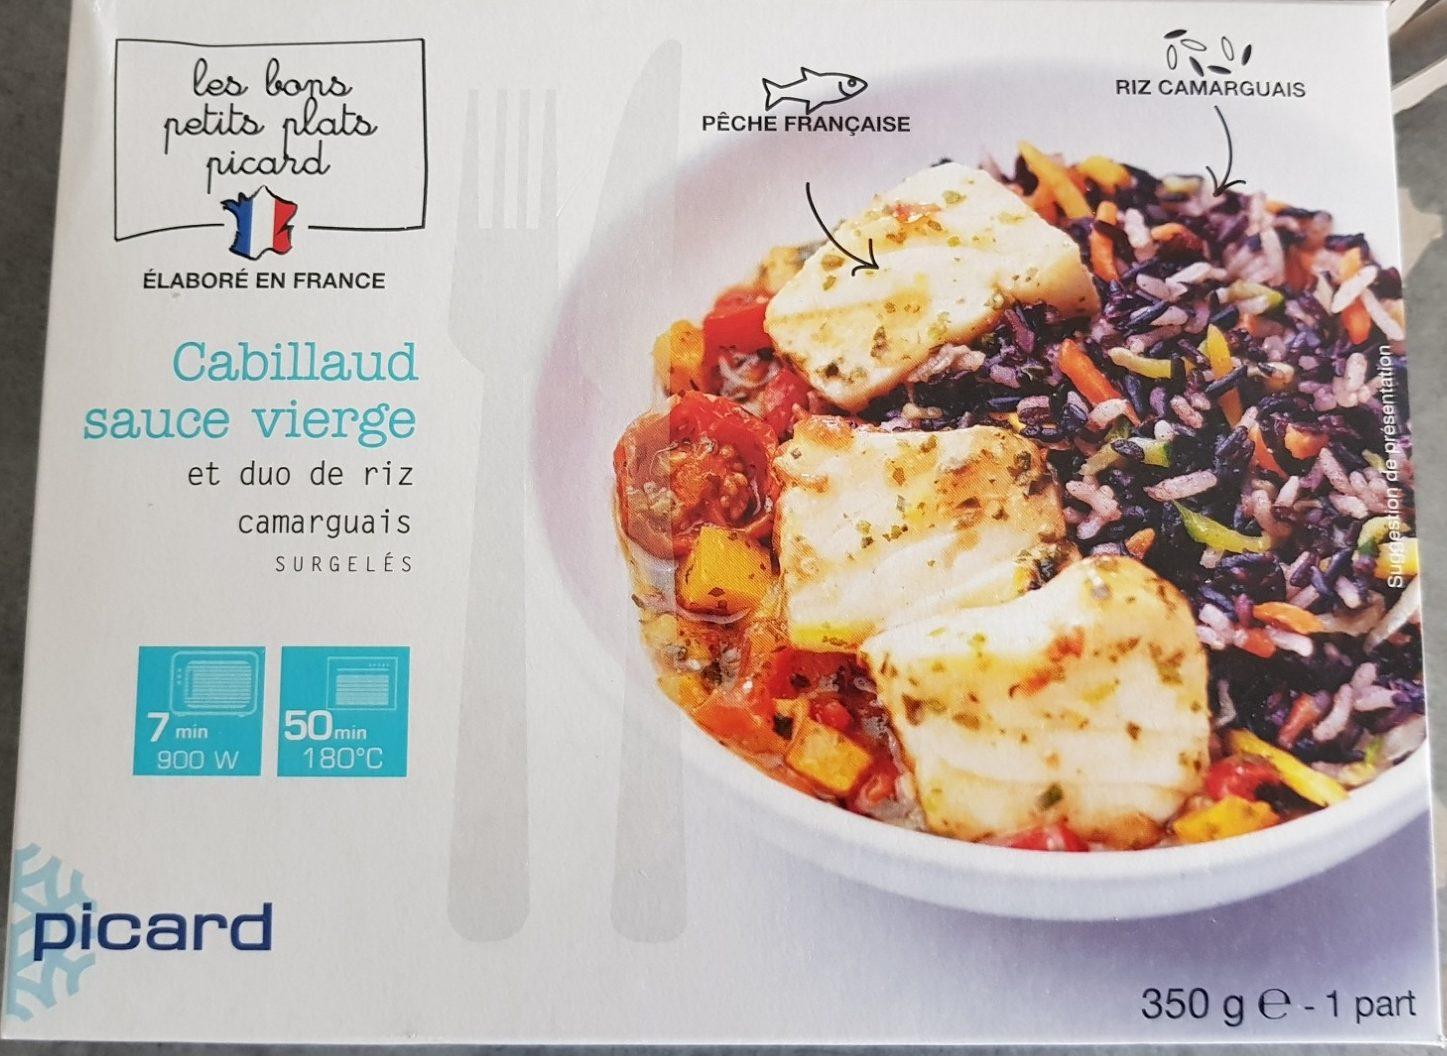 Cabillaud sauce vierge et duo de riz - Product - fr